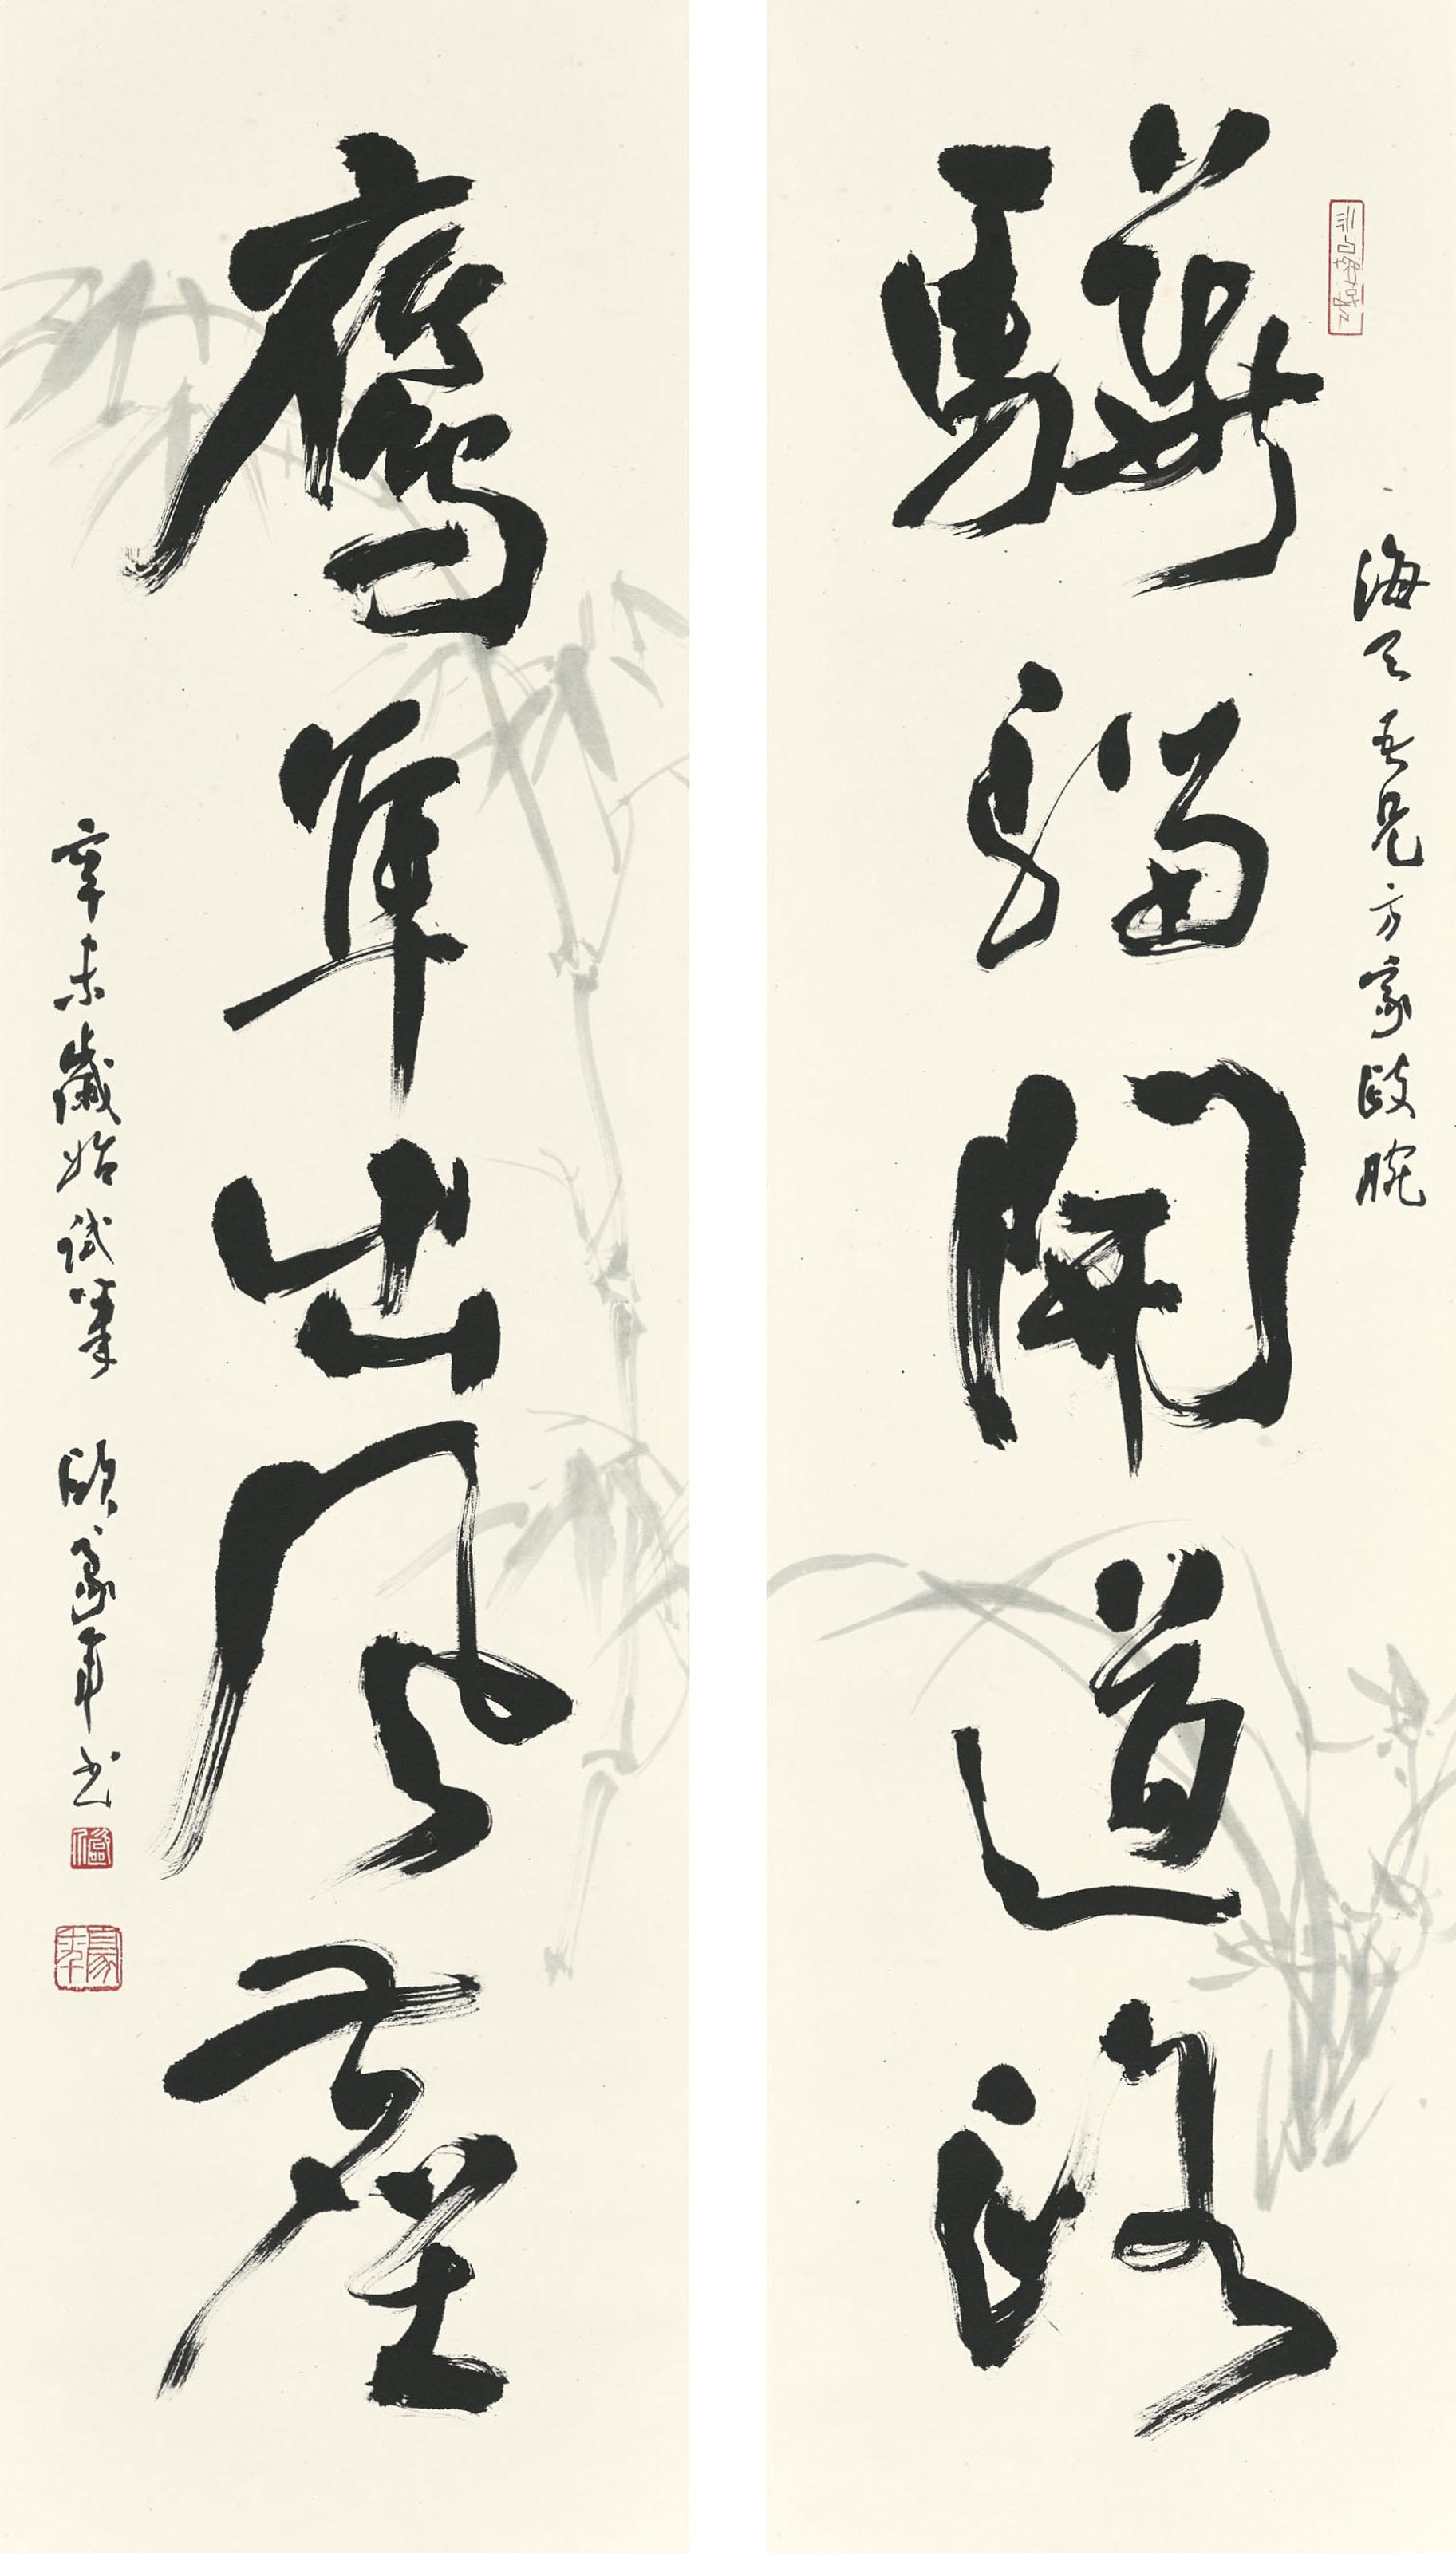 Calligraphic Couplet/Calligraphy in Running Script